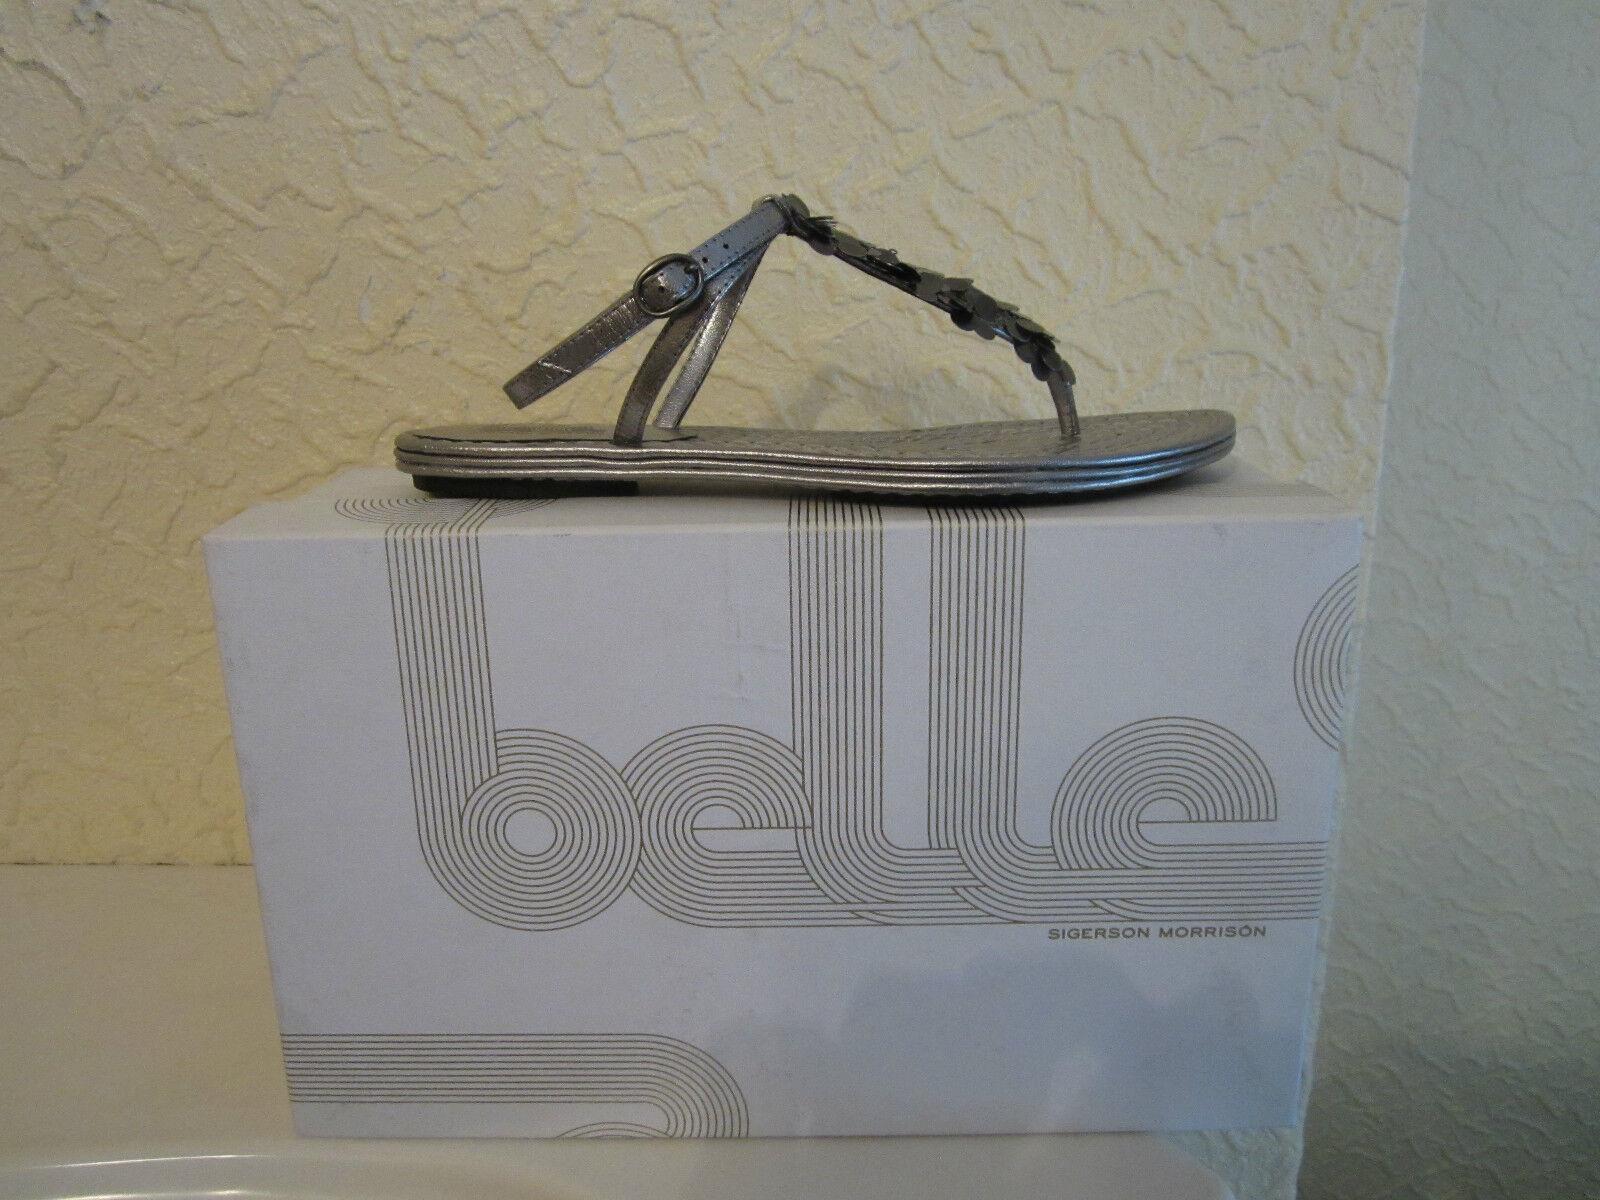 Belle by Sigerson Morrison PELTRO METALLIZZATO Tanga Sandali